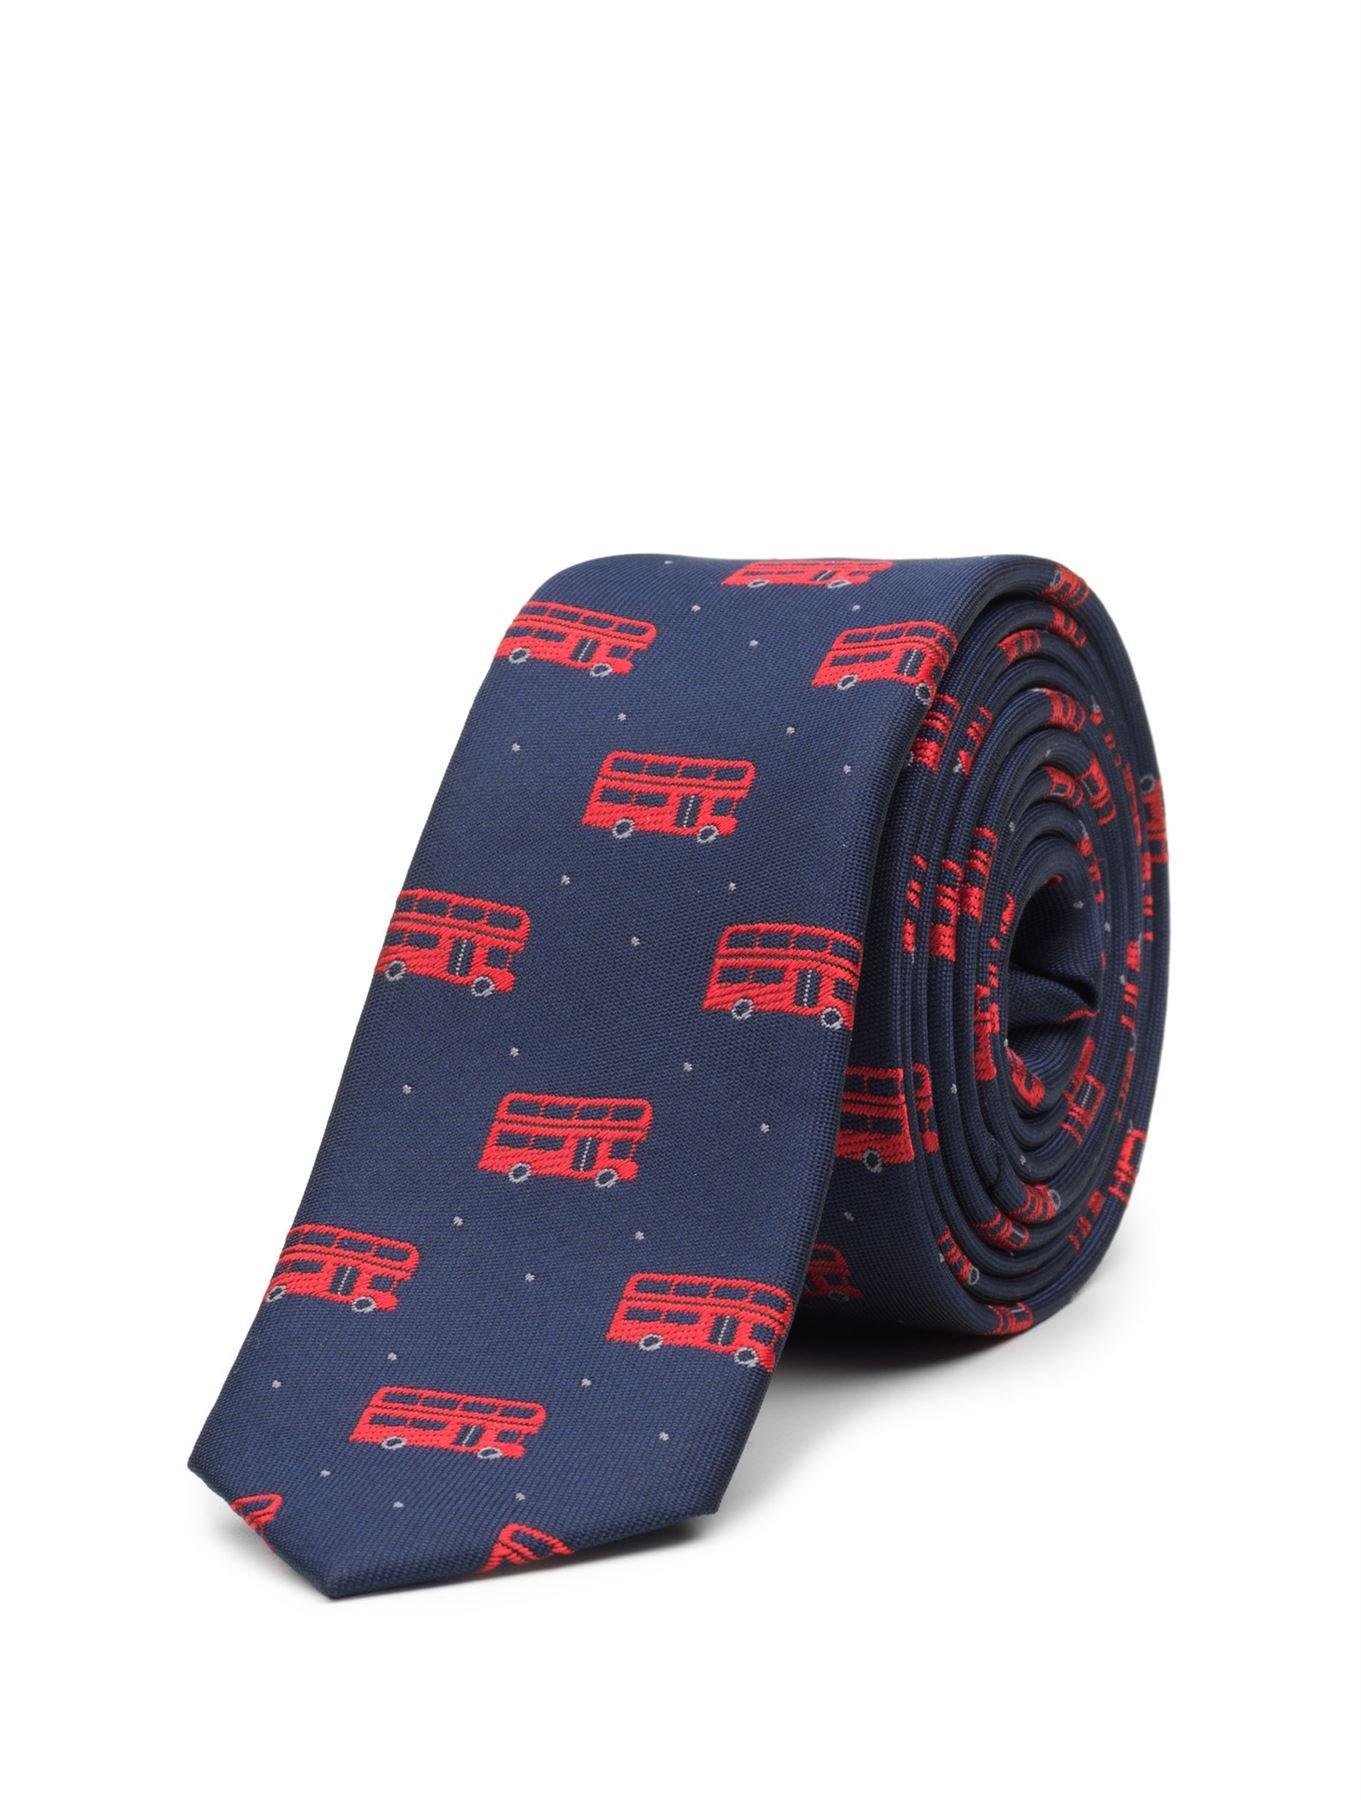 Paisley of London, Boys royal bus slim tie, one size